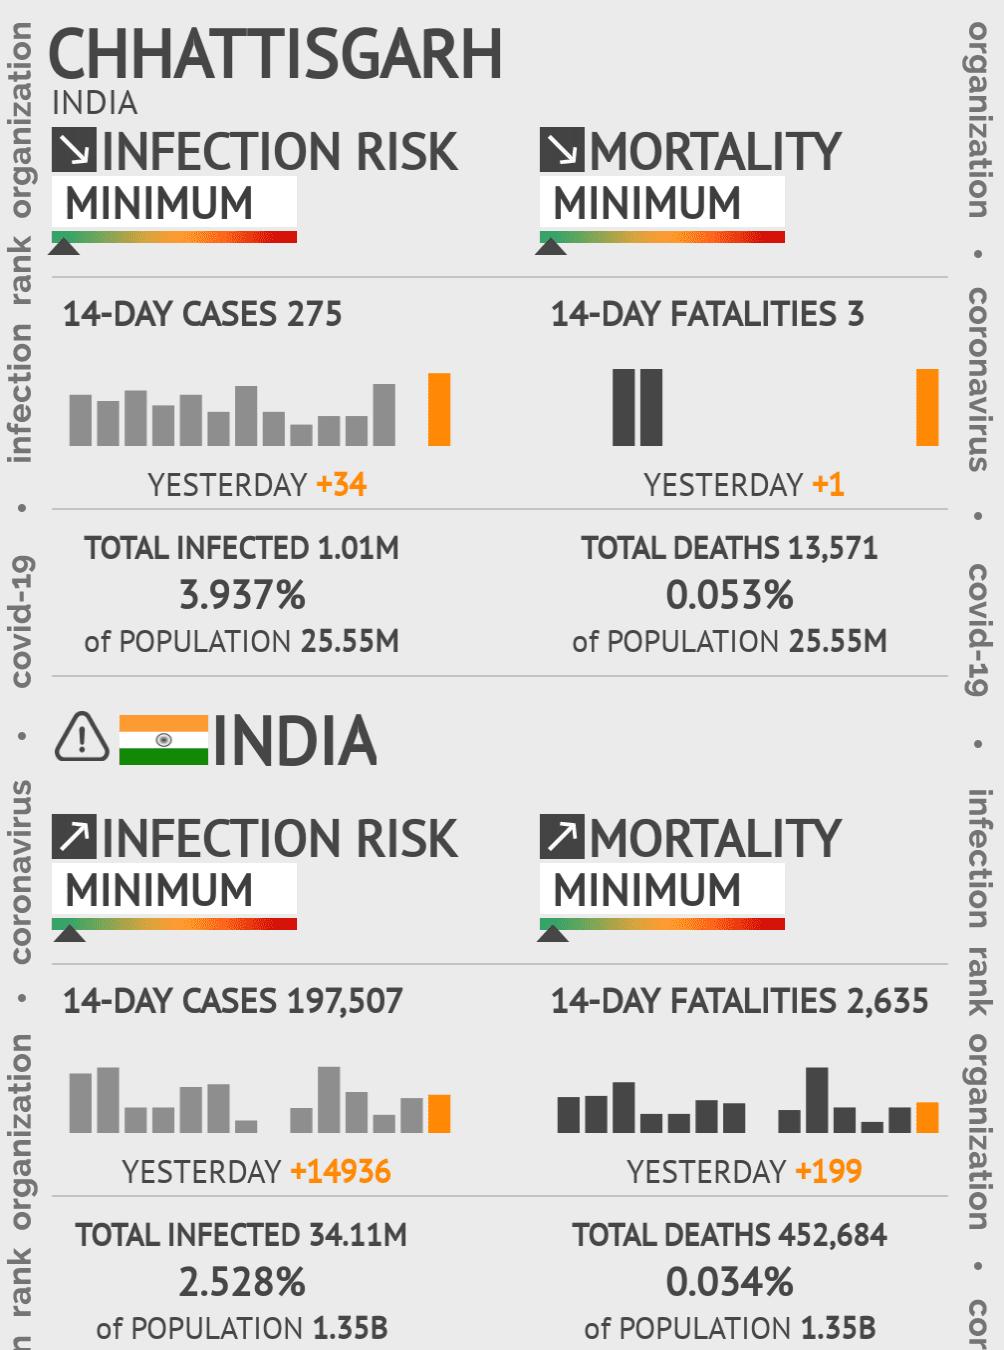 Chhattisgarh Coronavirus Covid-19 Risk of Infection Update for 27 Counties on January 25, 2021